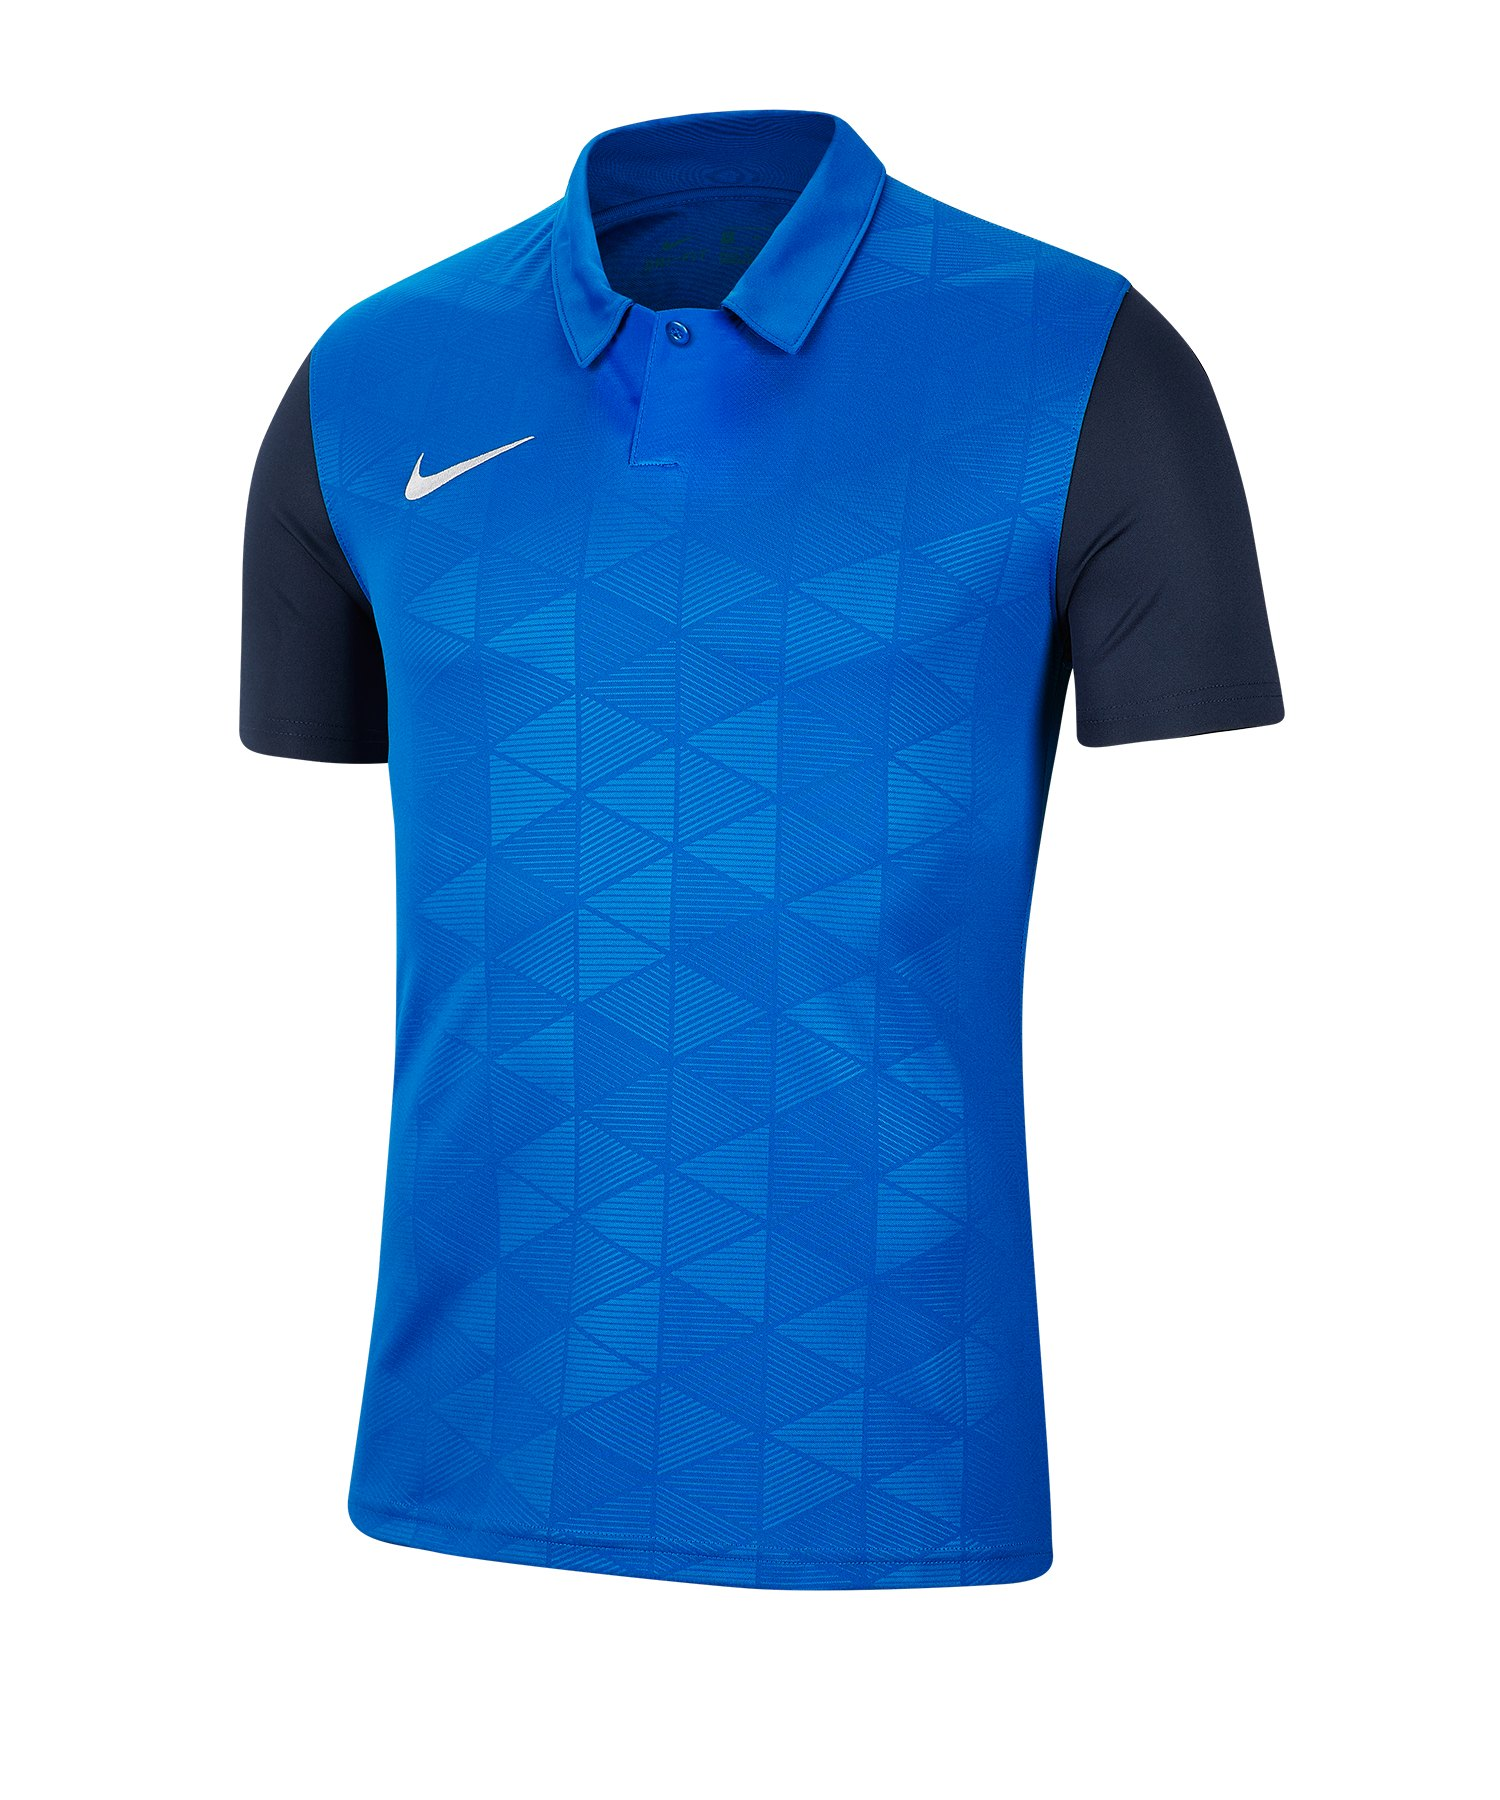 Nike Trophy IV Trikot Blau F463 - blau